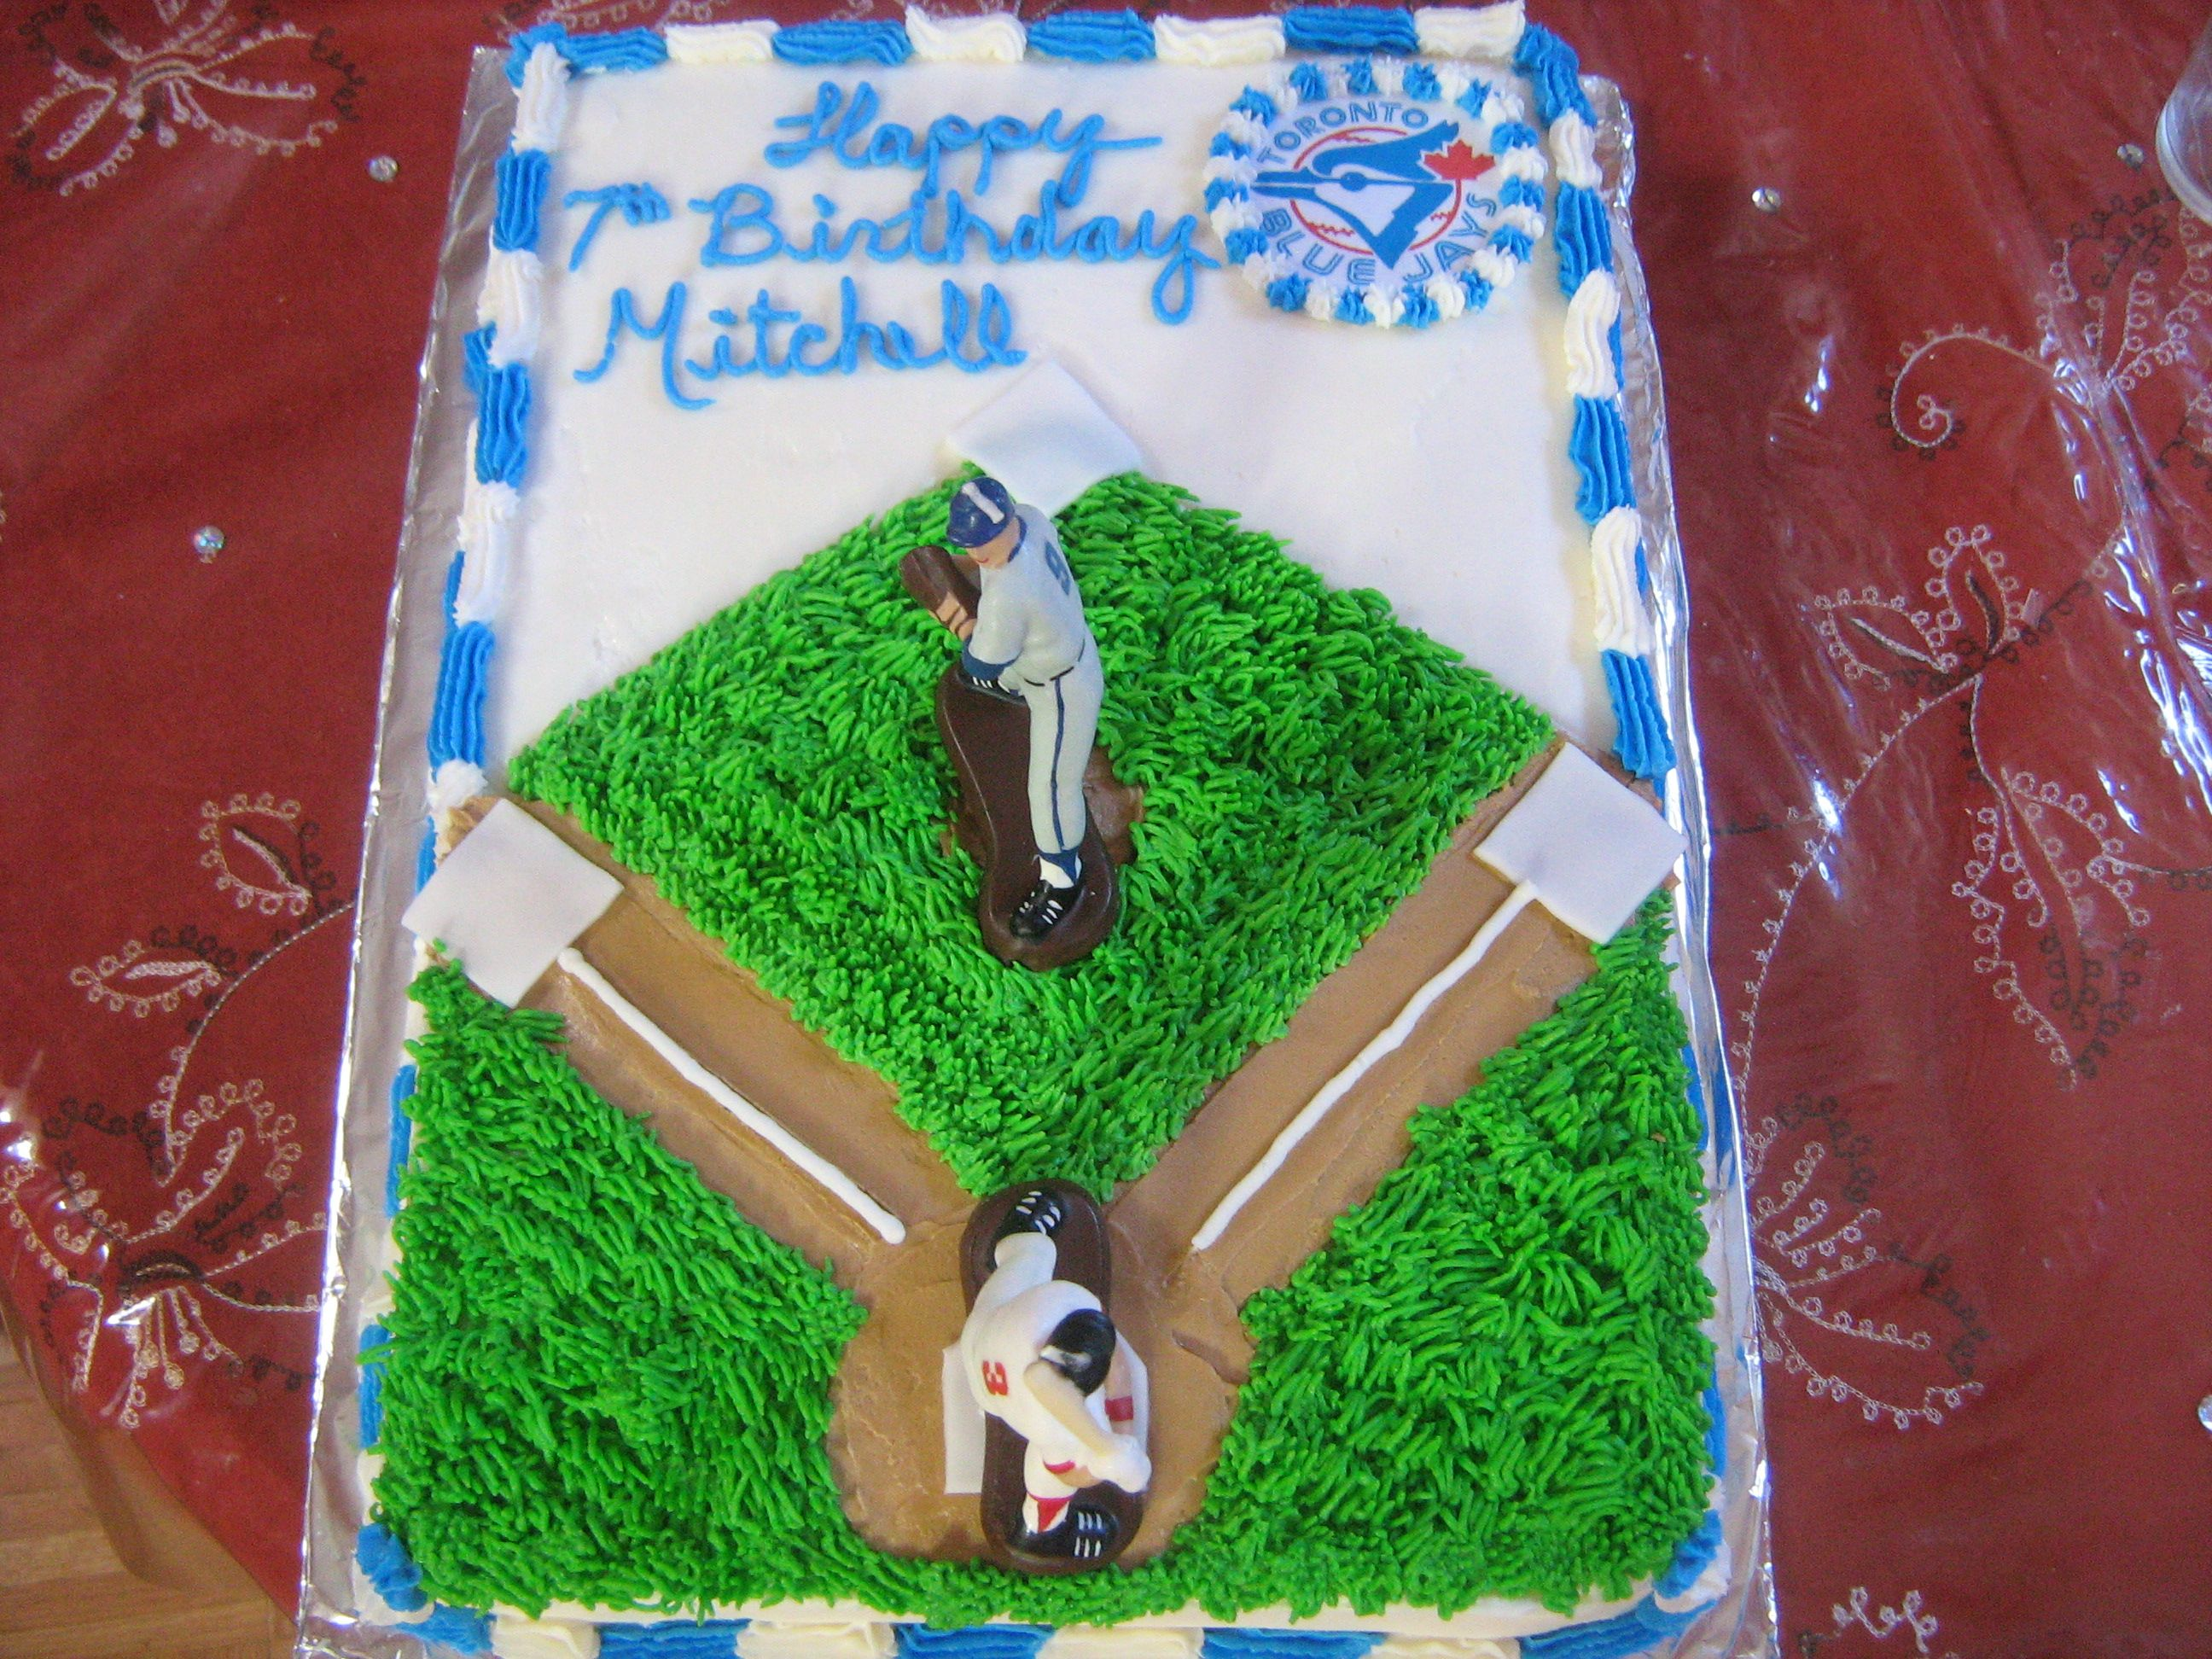 Baseball Field Cakes - Decoration Ideas   Little Birthday ...